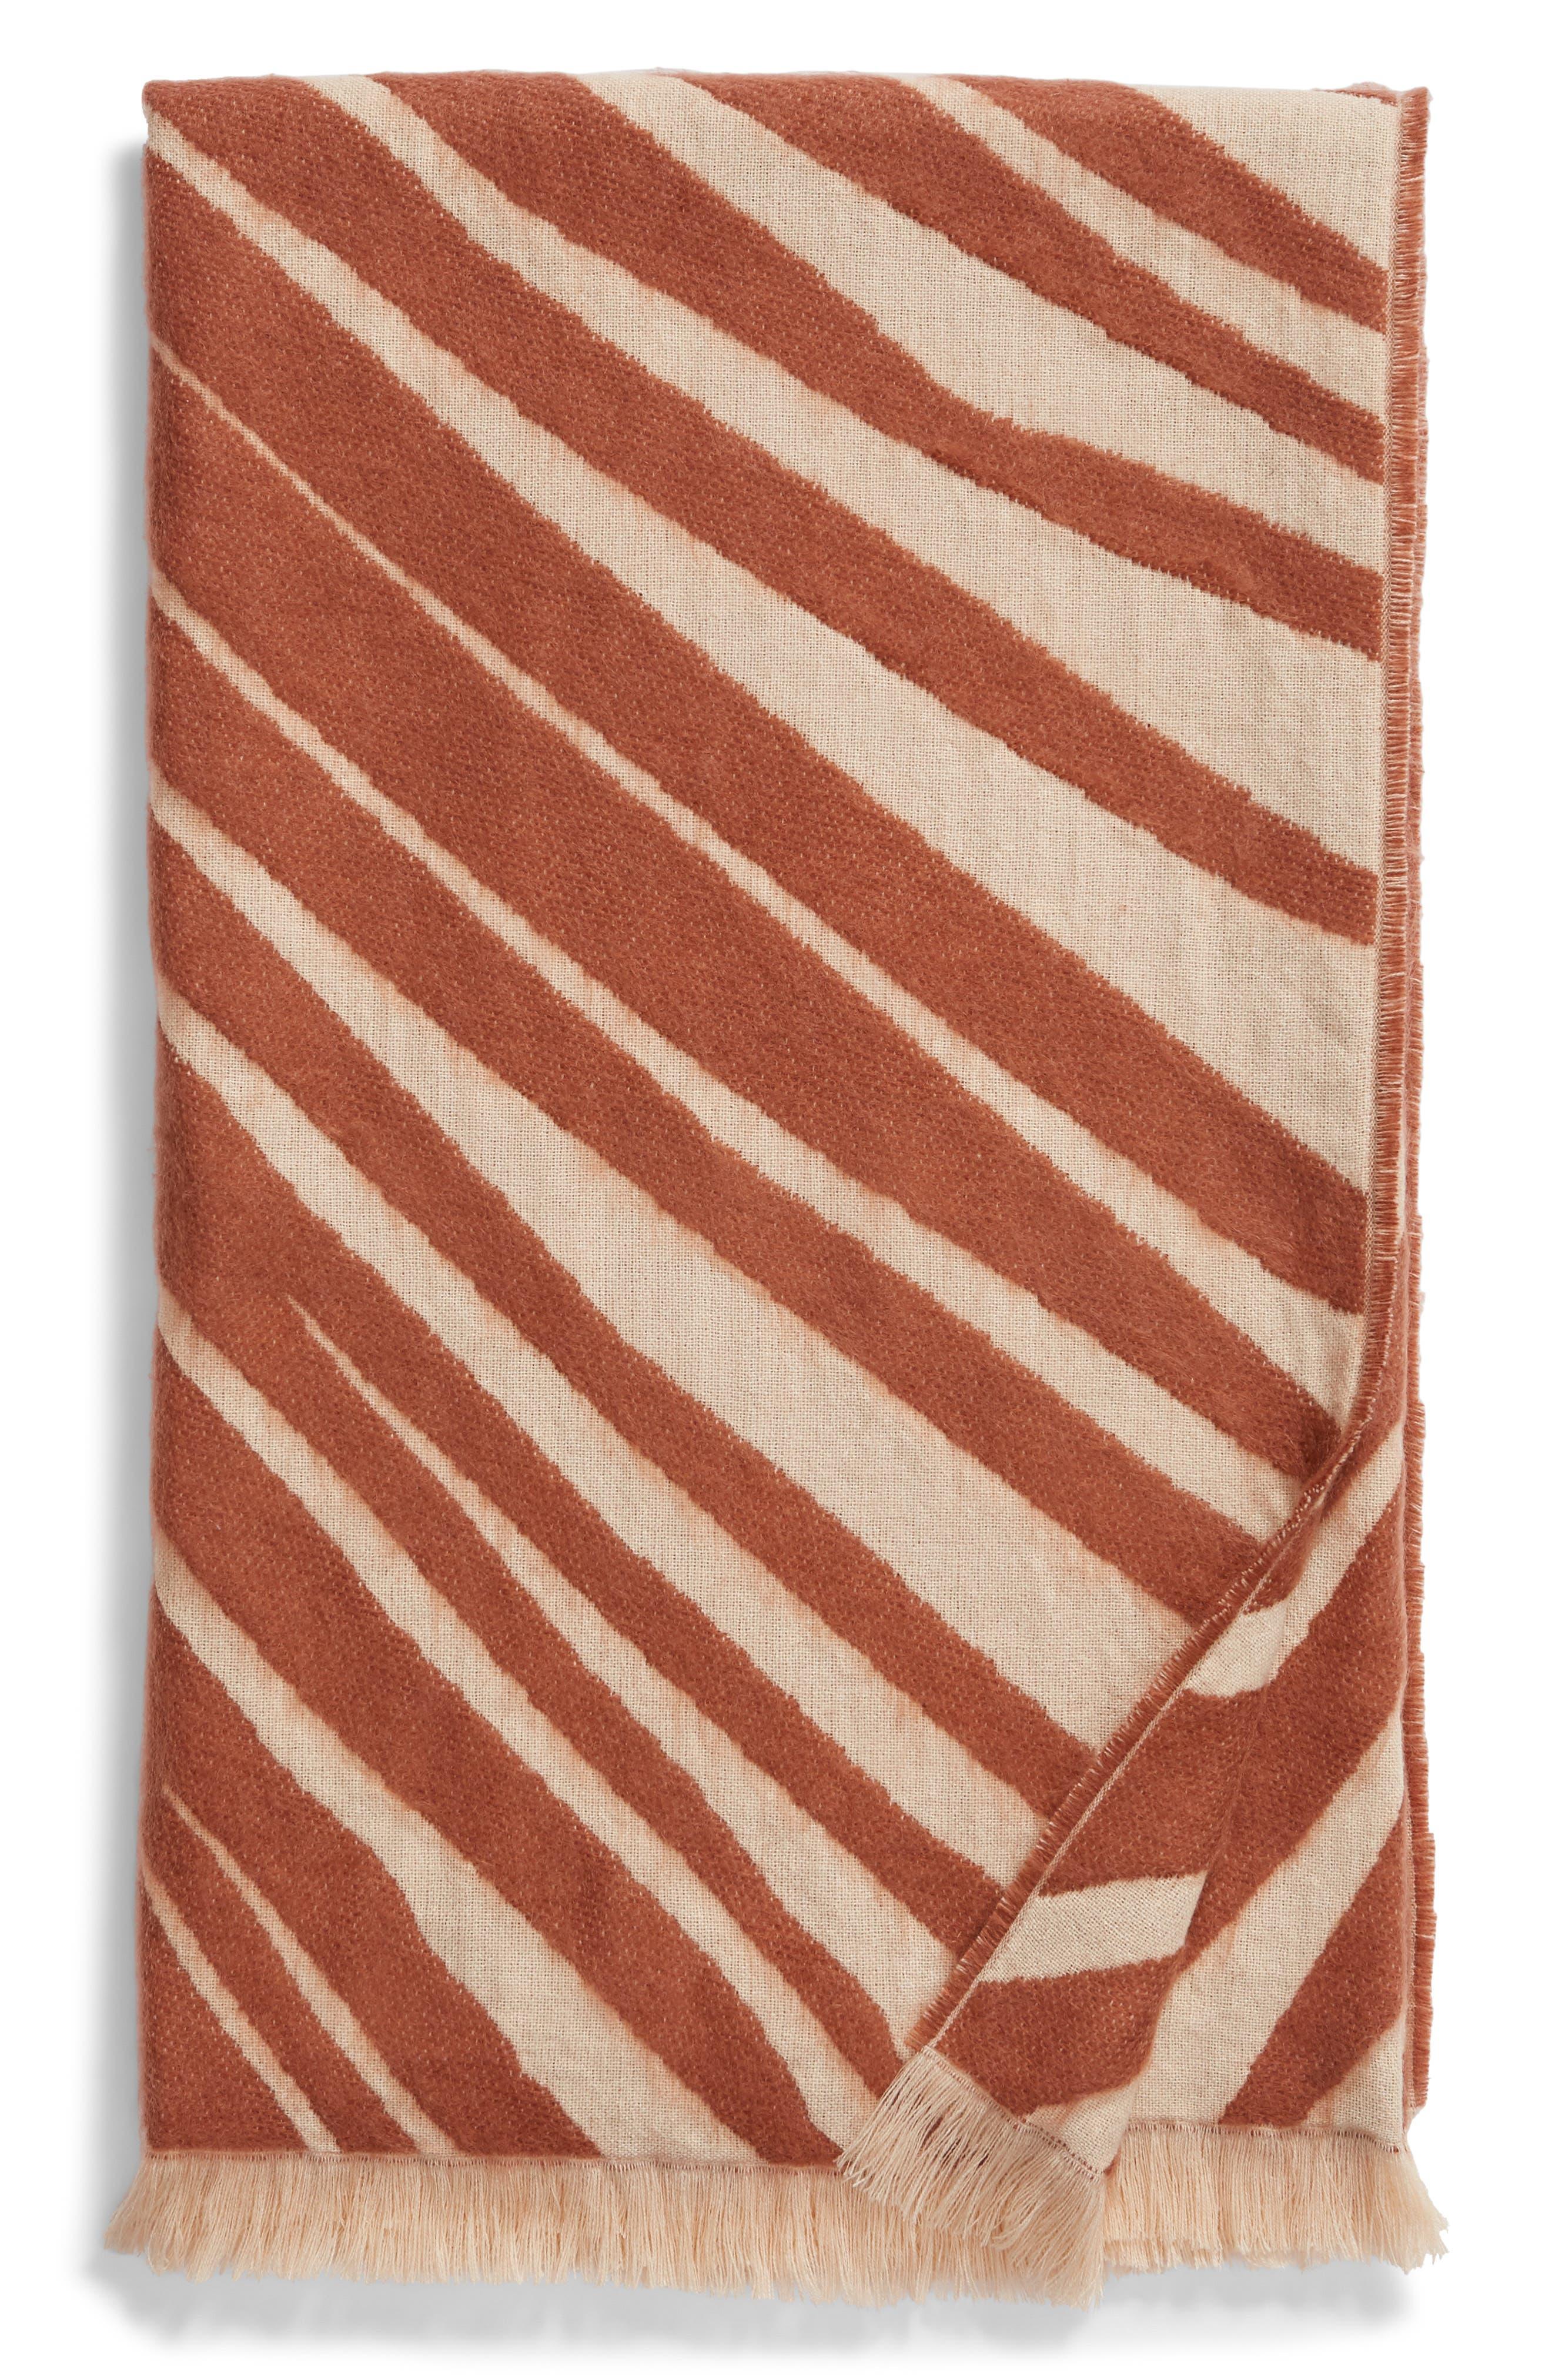 TREASURE & BOND Palm Leaf Jacquard Throw Blanket, Main, color, BEIGE DUNE MULTI